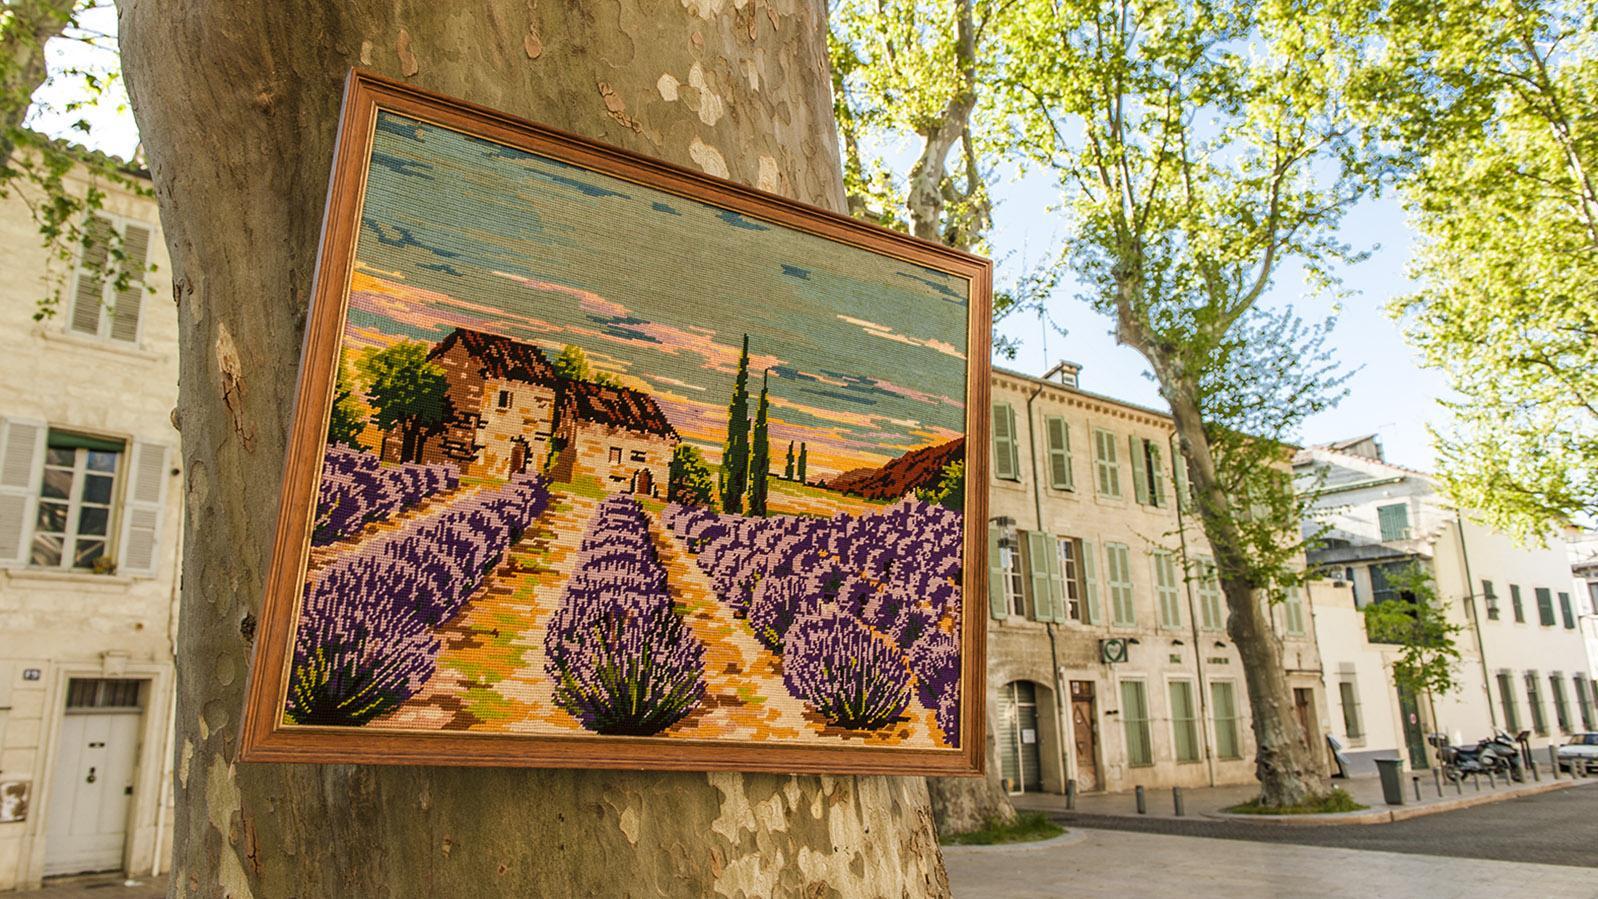 Die Place des Carmes lädt sonntags zum Trödeln. Foto: Hilke Maunder